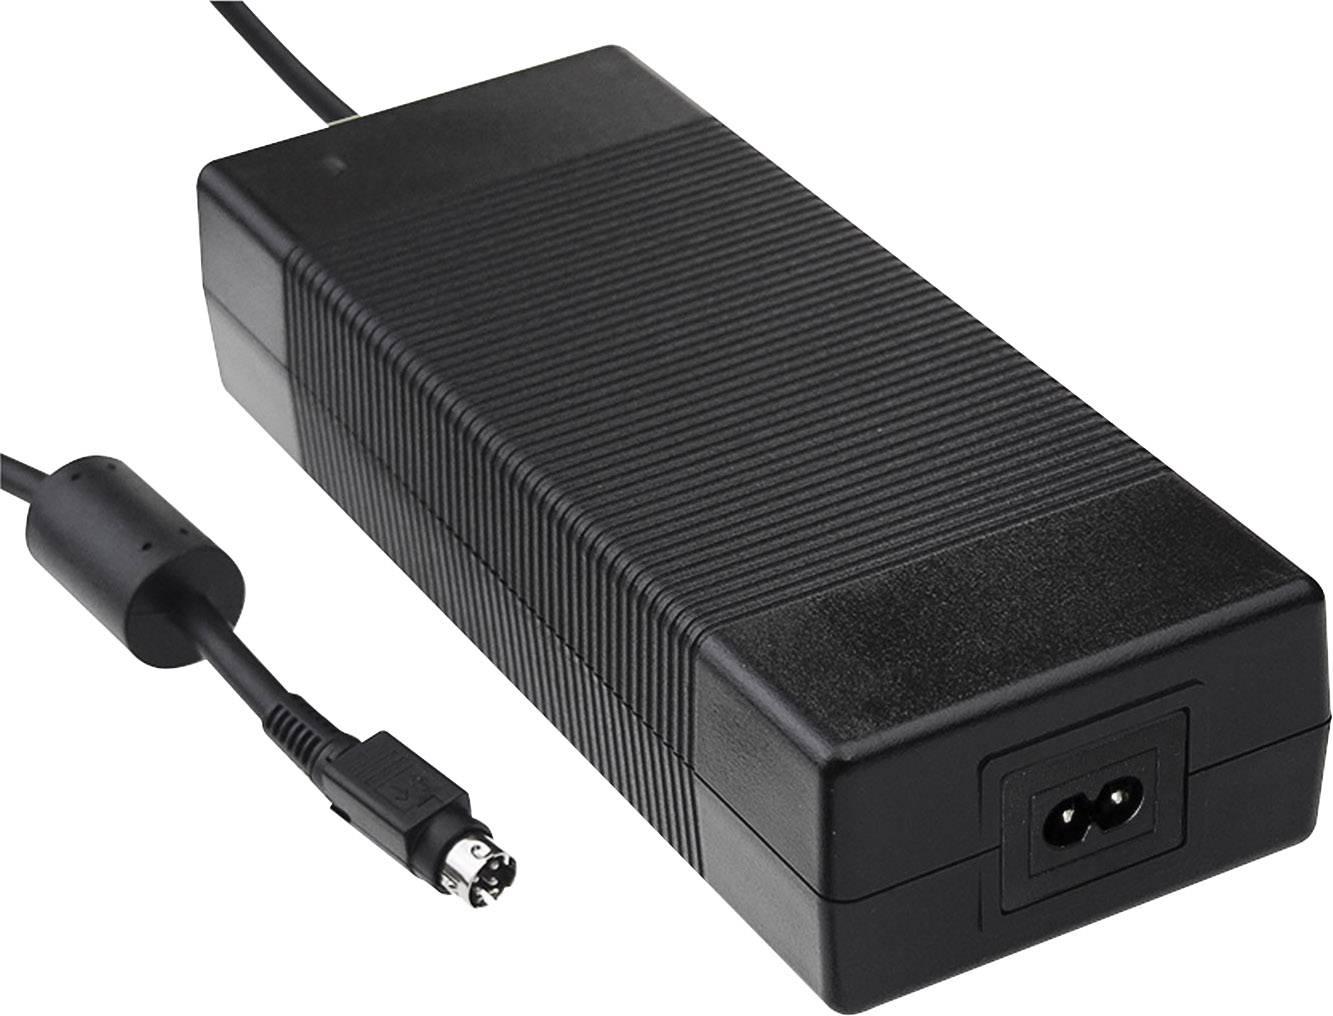 Stolní napájecí adaptér, stálé napětí Mean Well GSM220B15-R7B 15 V/DC 13.4 A 201 W